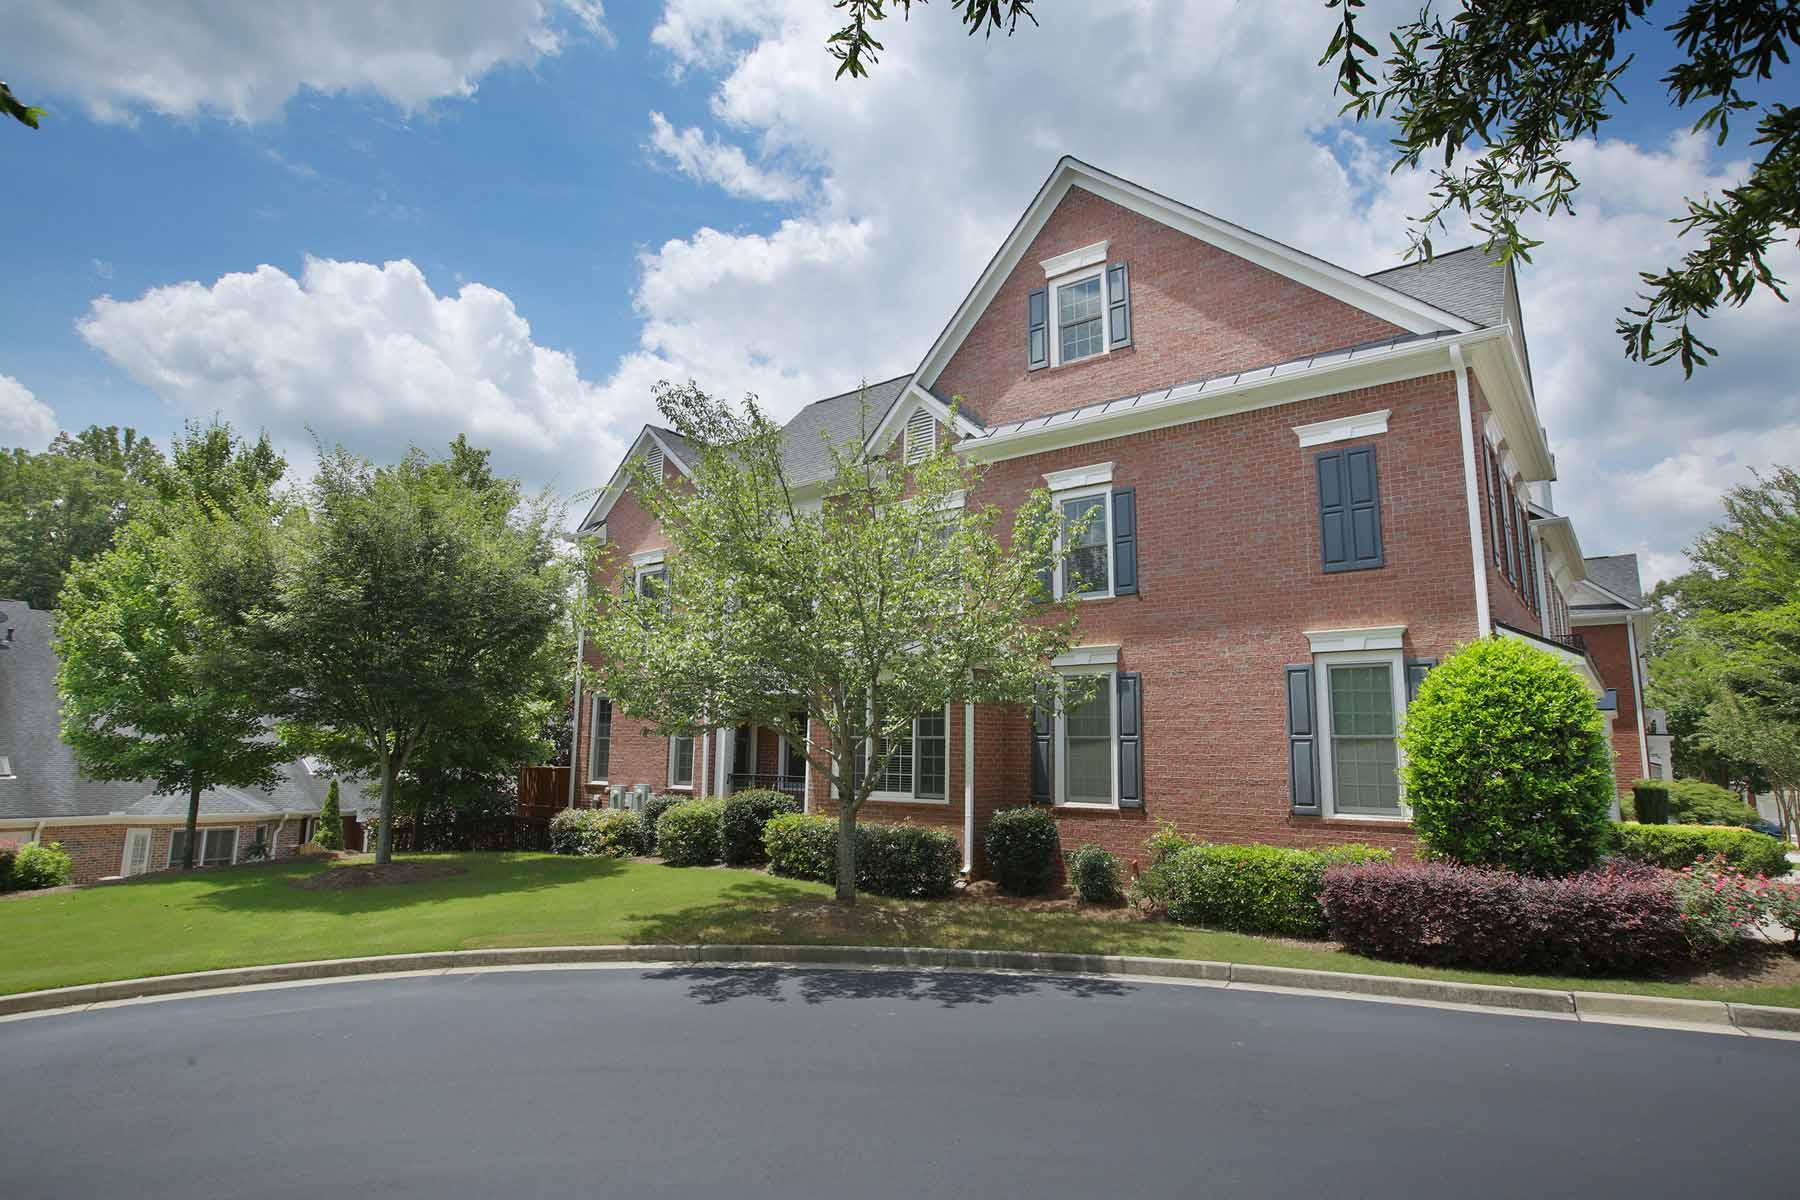 联栋屋 为 销售 在 Location and Convenience All in One 12568 Wexcroft Lane Alpharetta, 乔治亚州 30009 美国